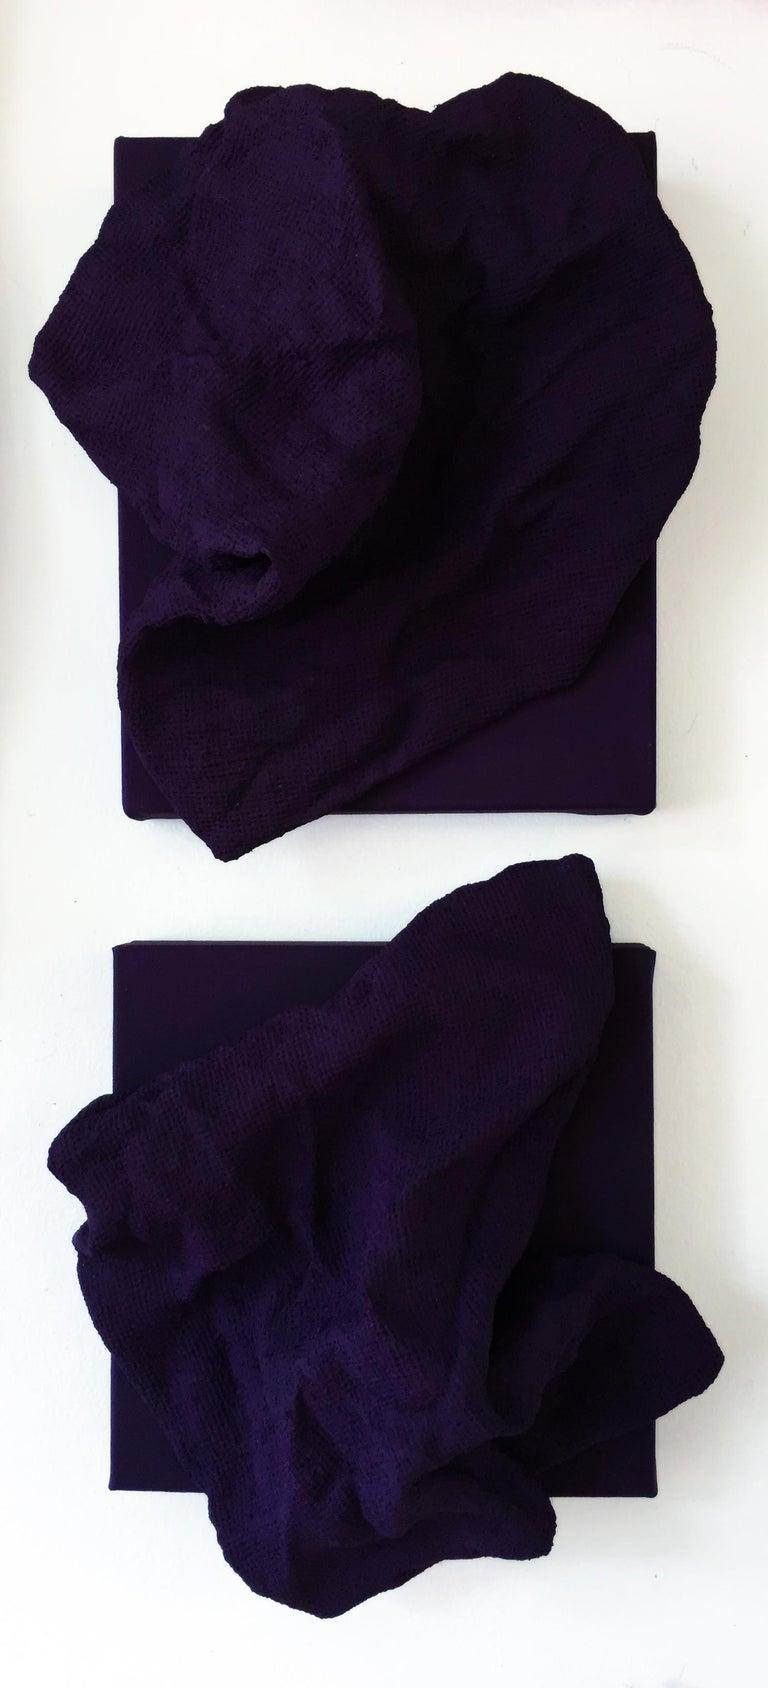 Egyptian Violet Folds - Pair - Mixed Media Art by Chloe Hedden